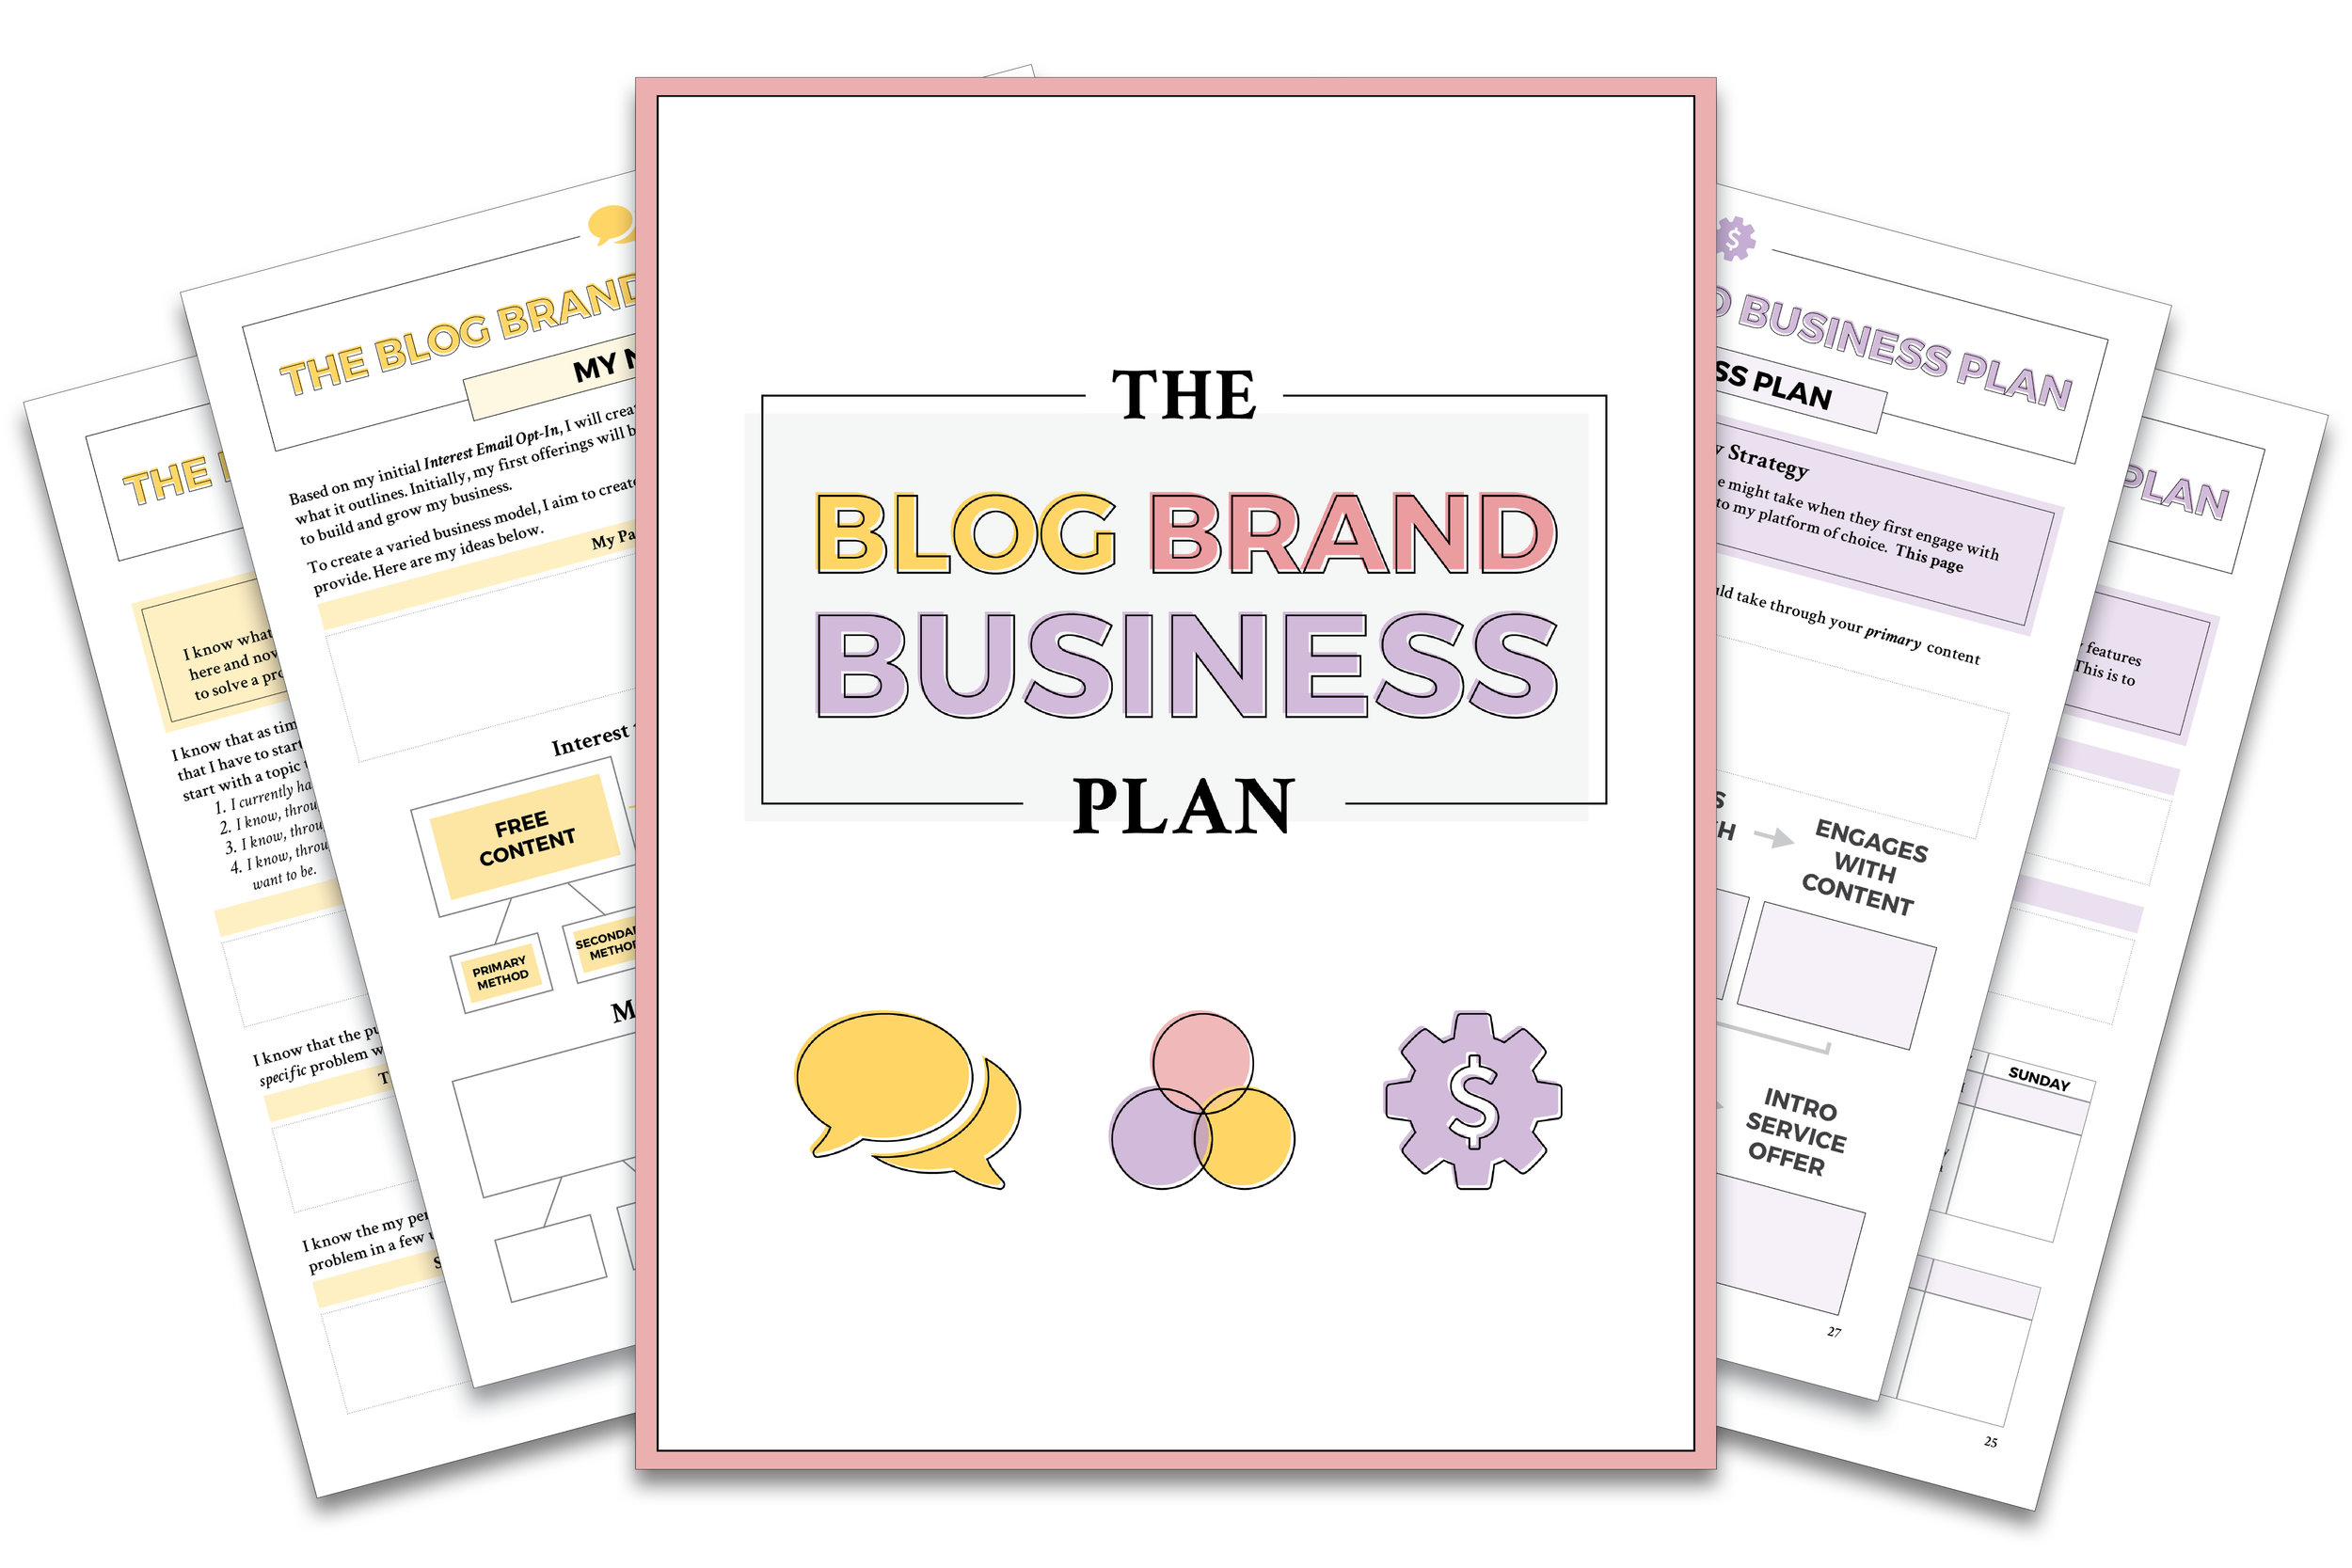 The Blog Brand Business Plan   by Yuri Gibson of viaYuri.com